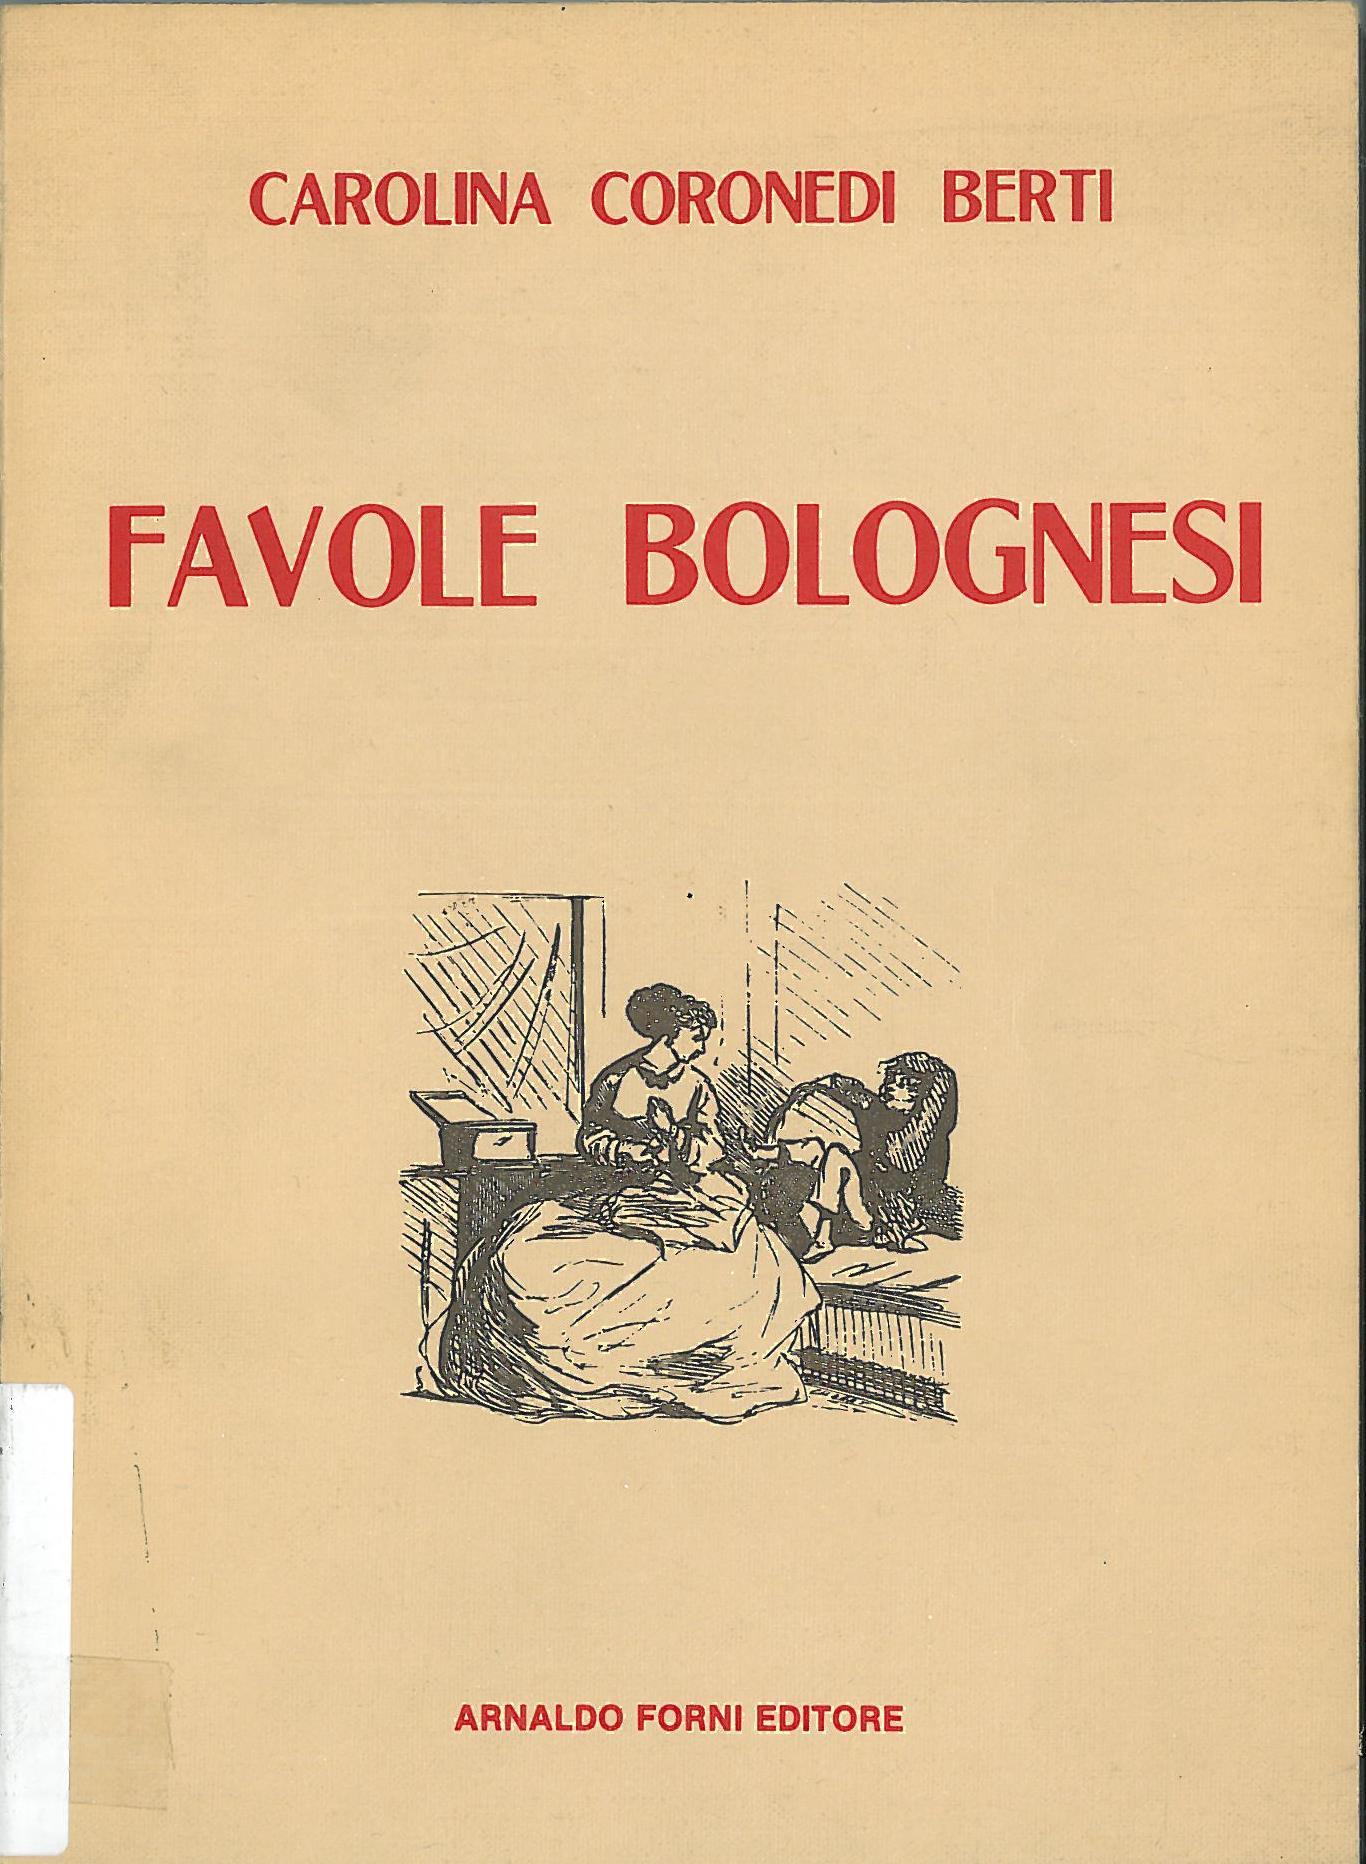 Favole bolognesi